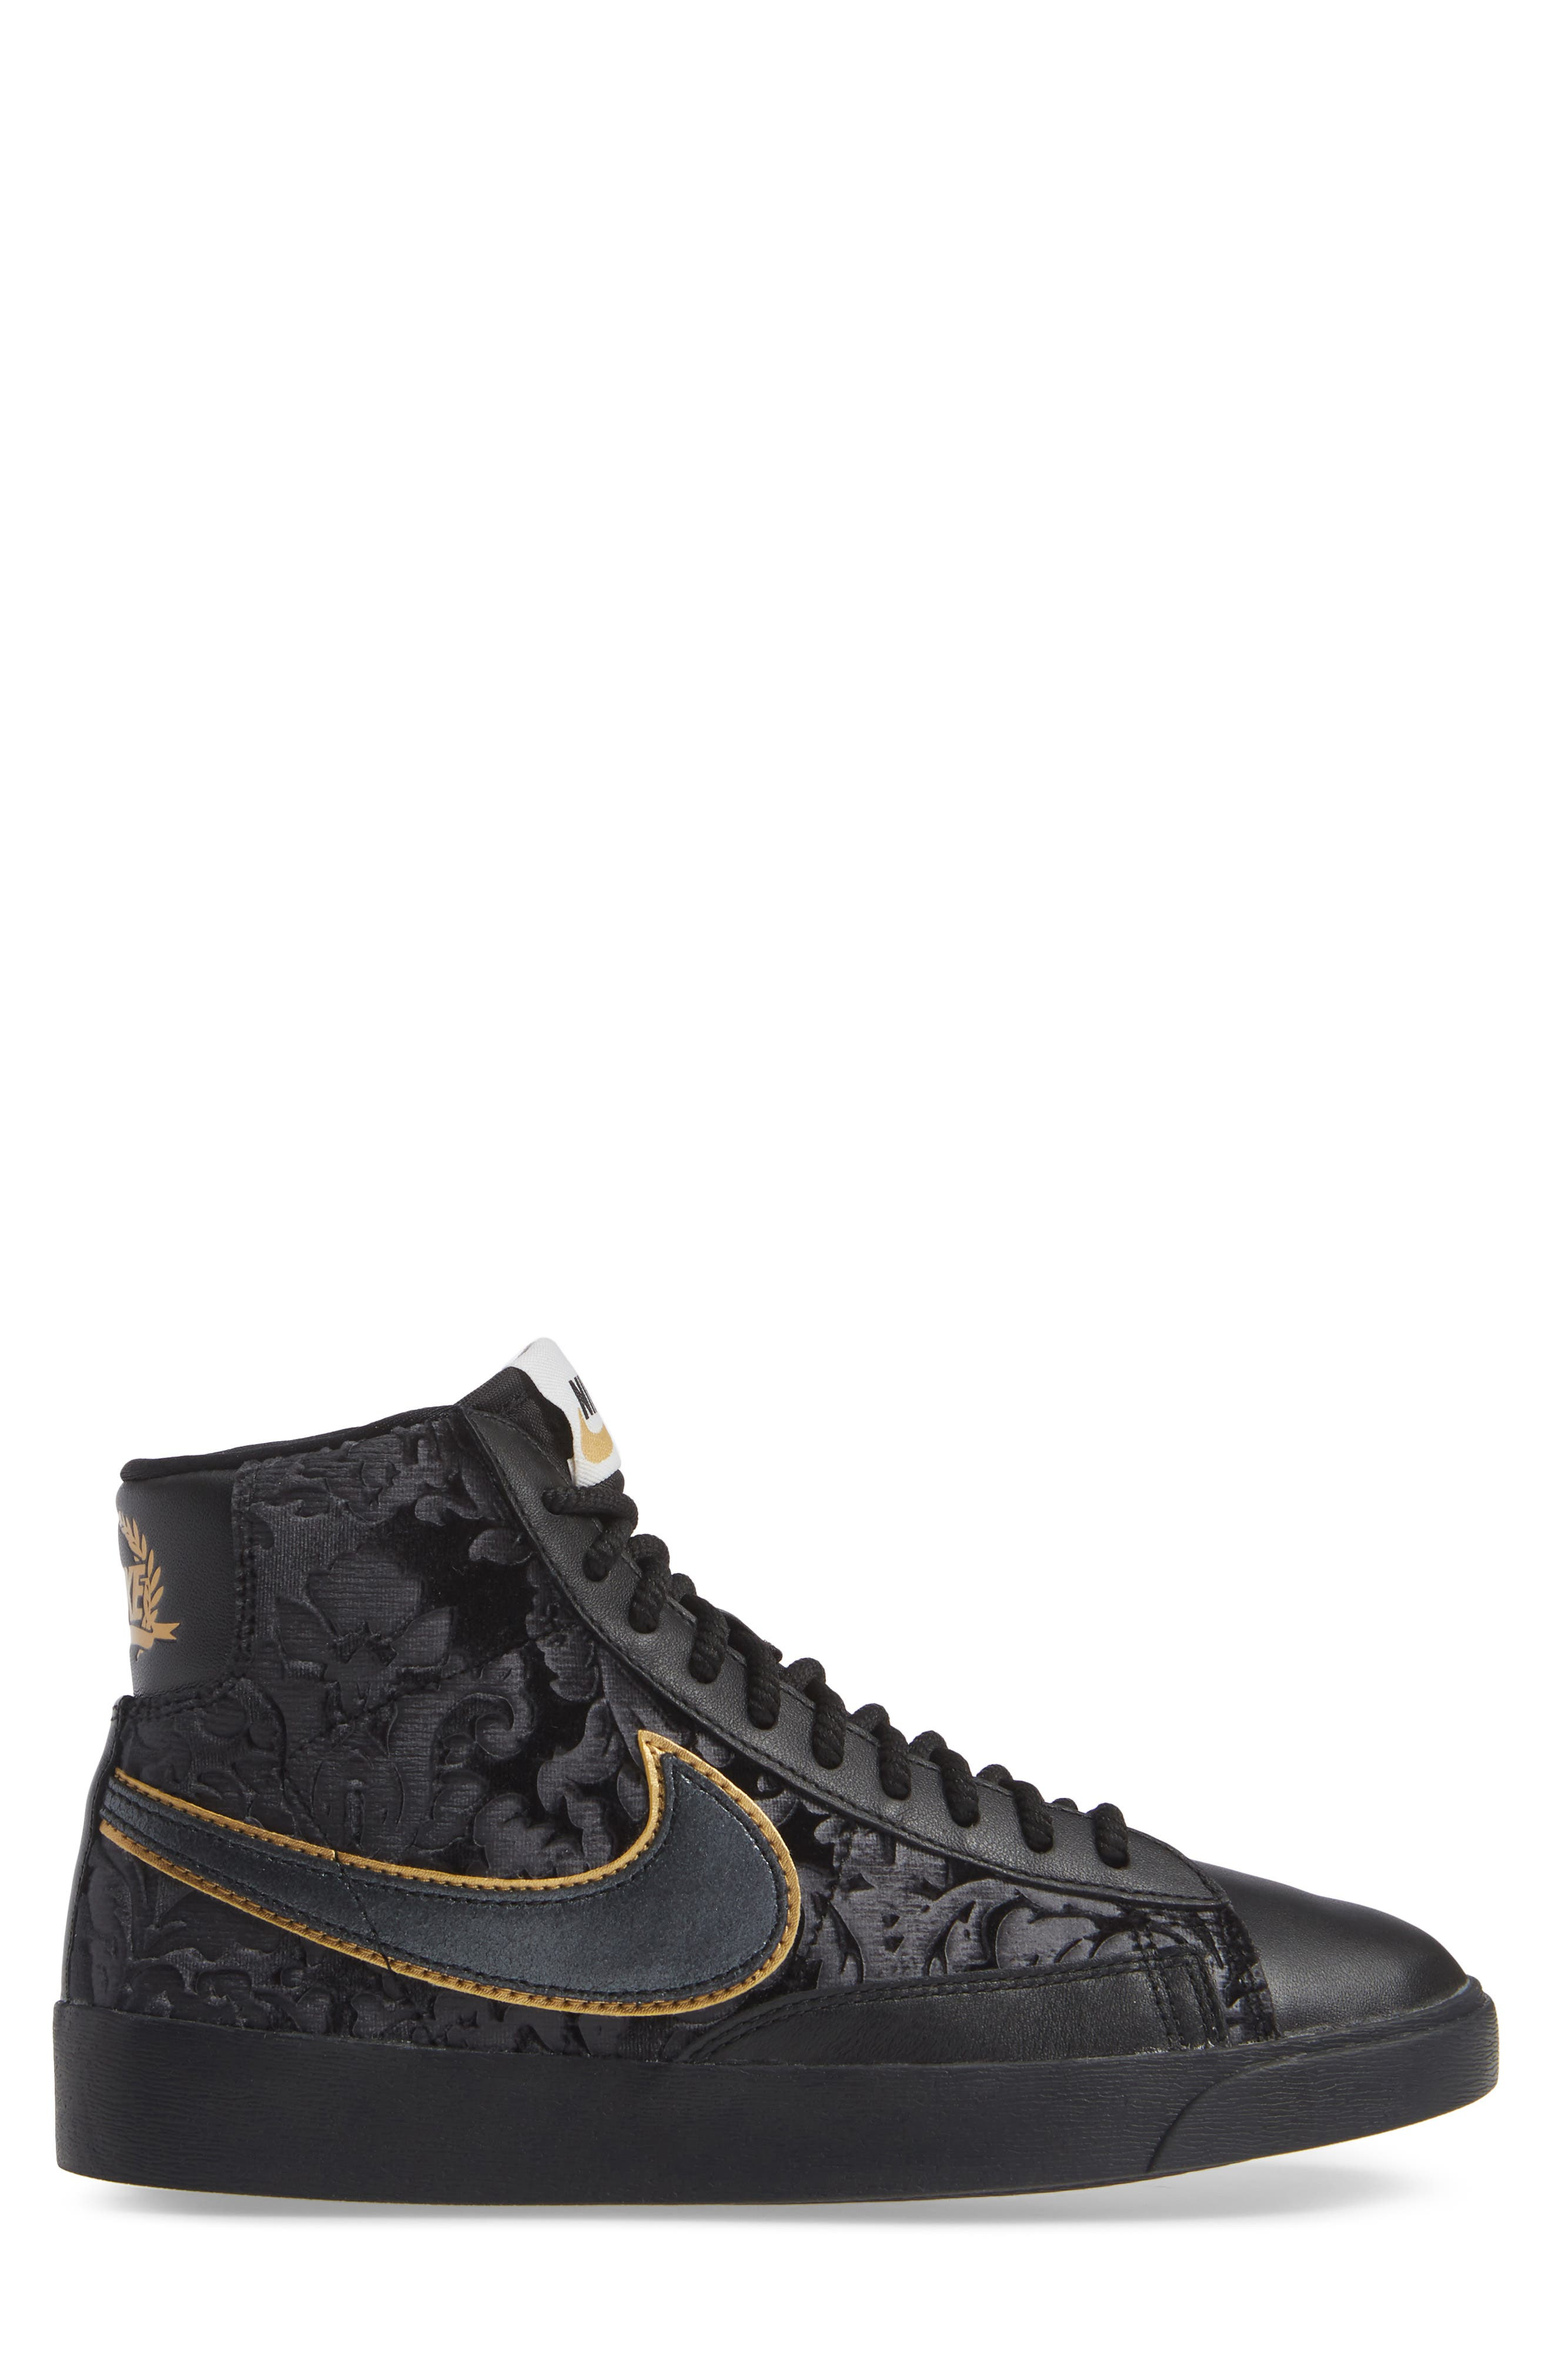 NIKE, Blazer Mid Top Sneaker, Alternate thumbnail 3, color, BLACK/ GOLD/ SUMMIT WHITE